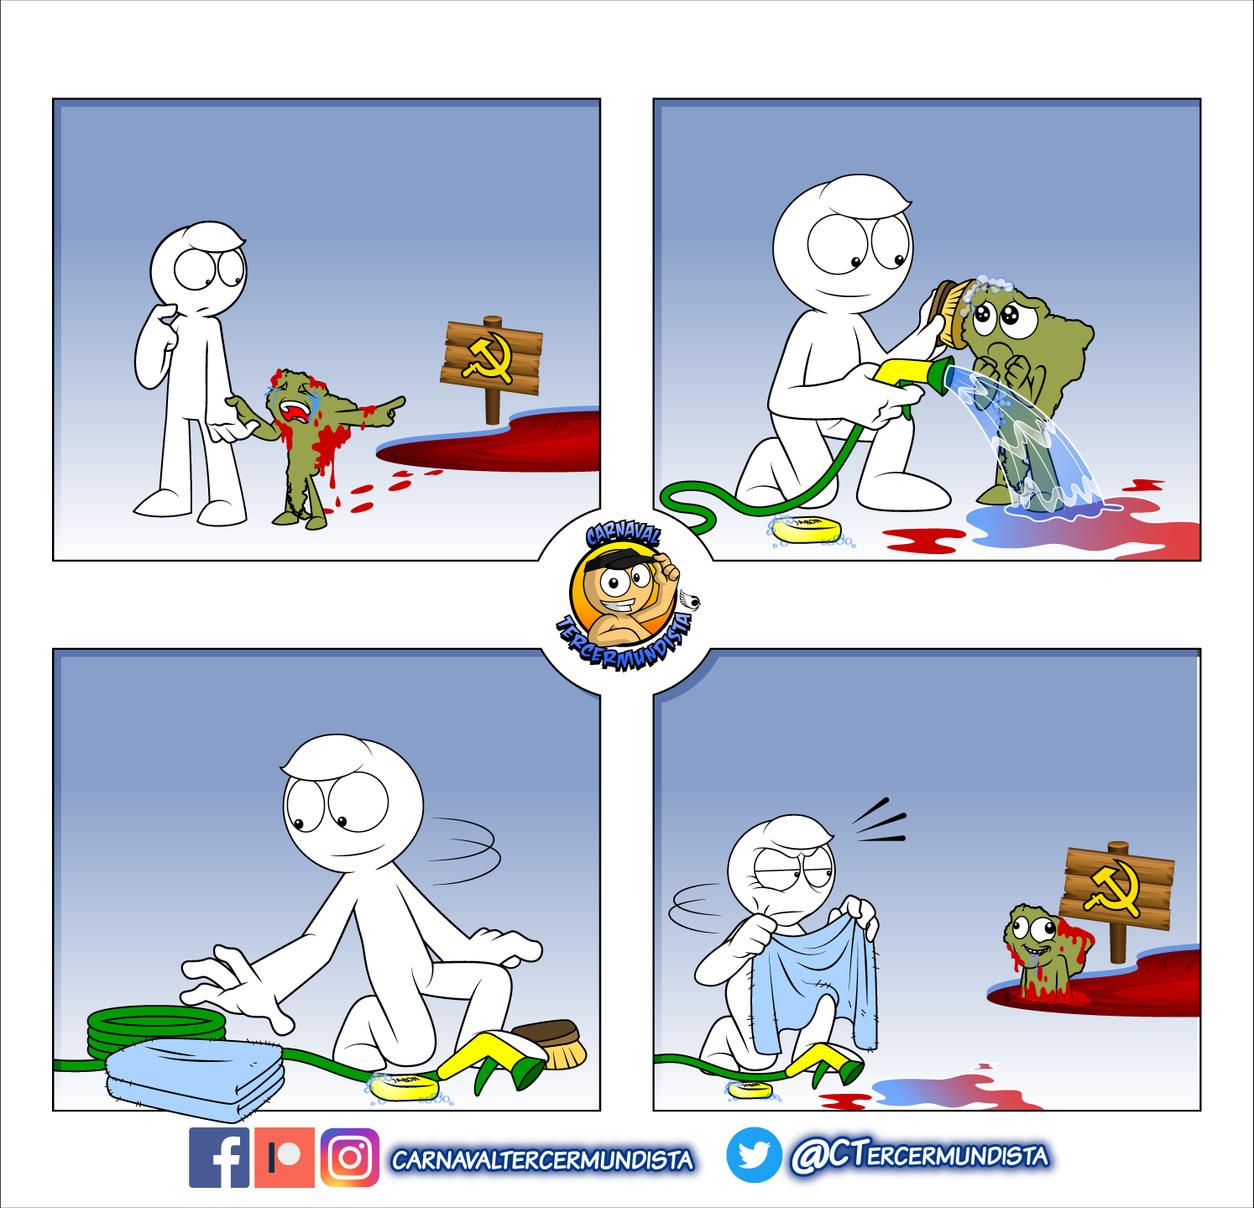 sudacalandia be like - meme